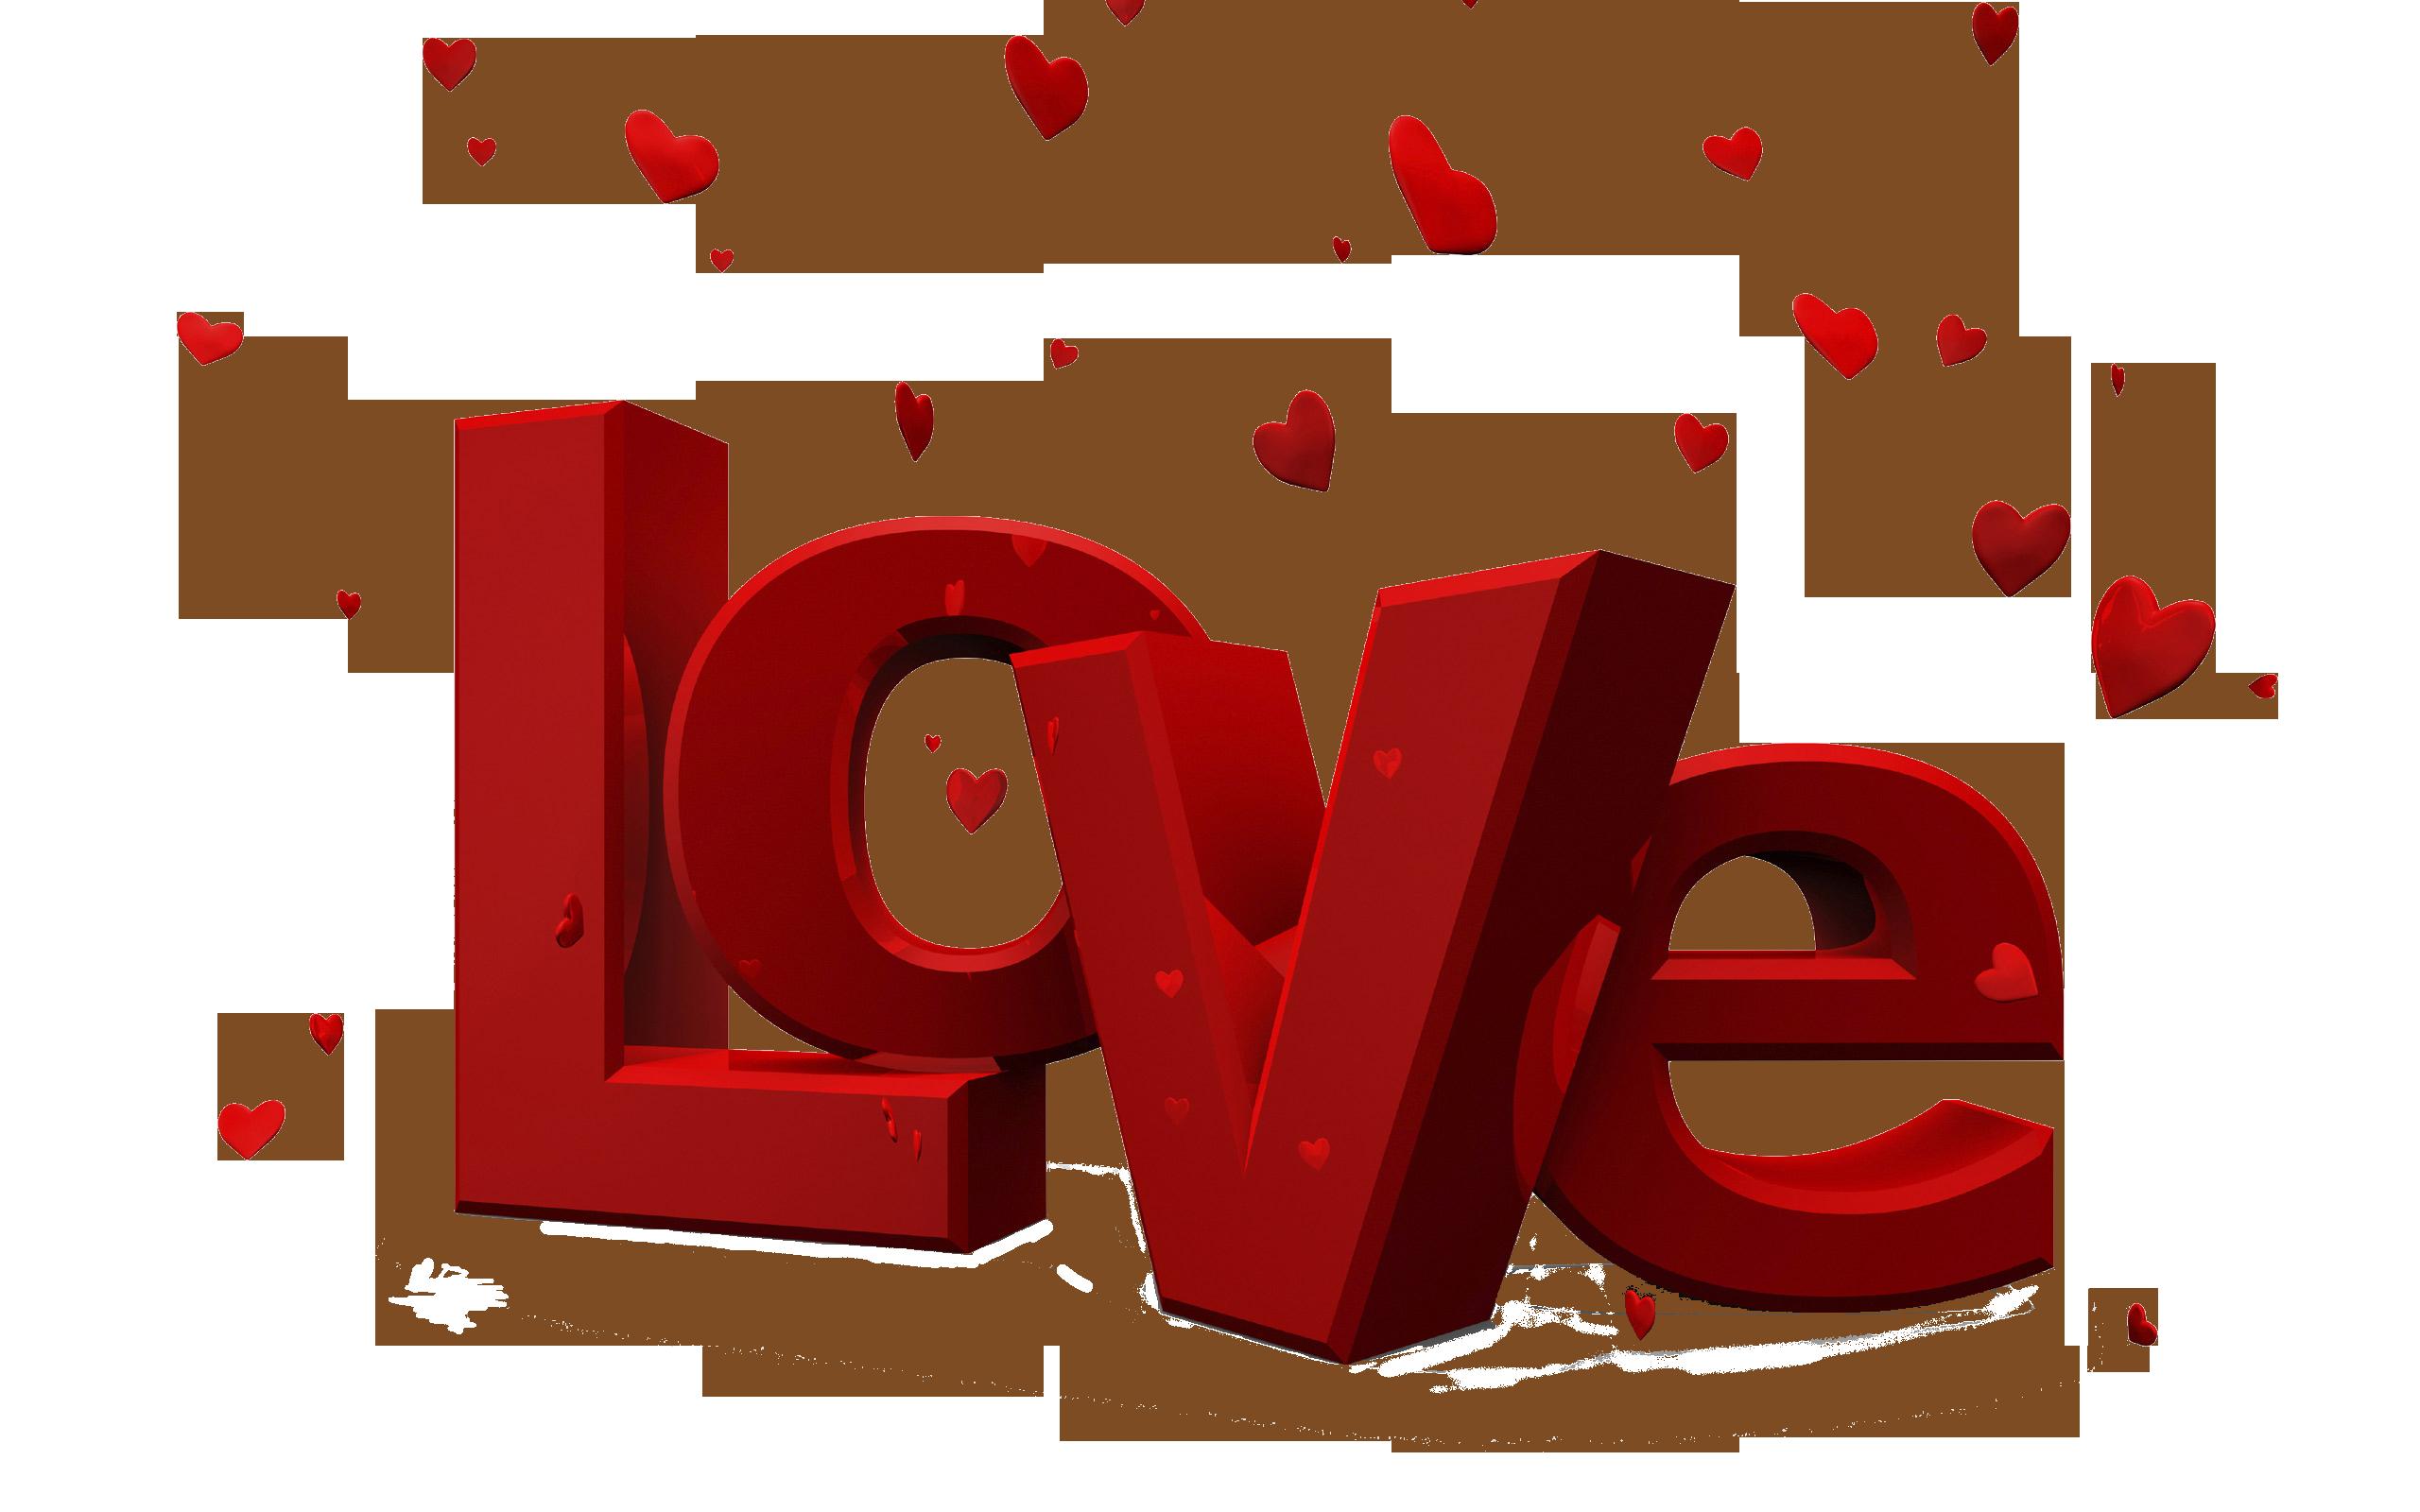 Download Love Download Png HQ PNG Image | FreePNGImg